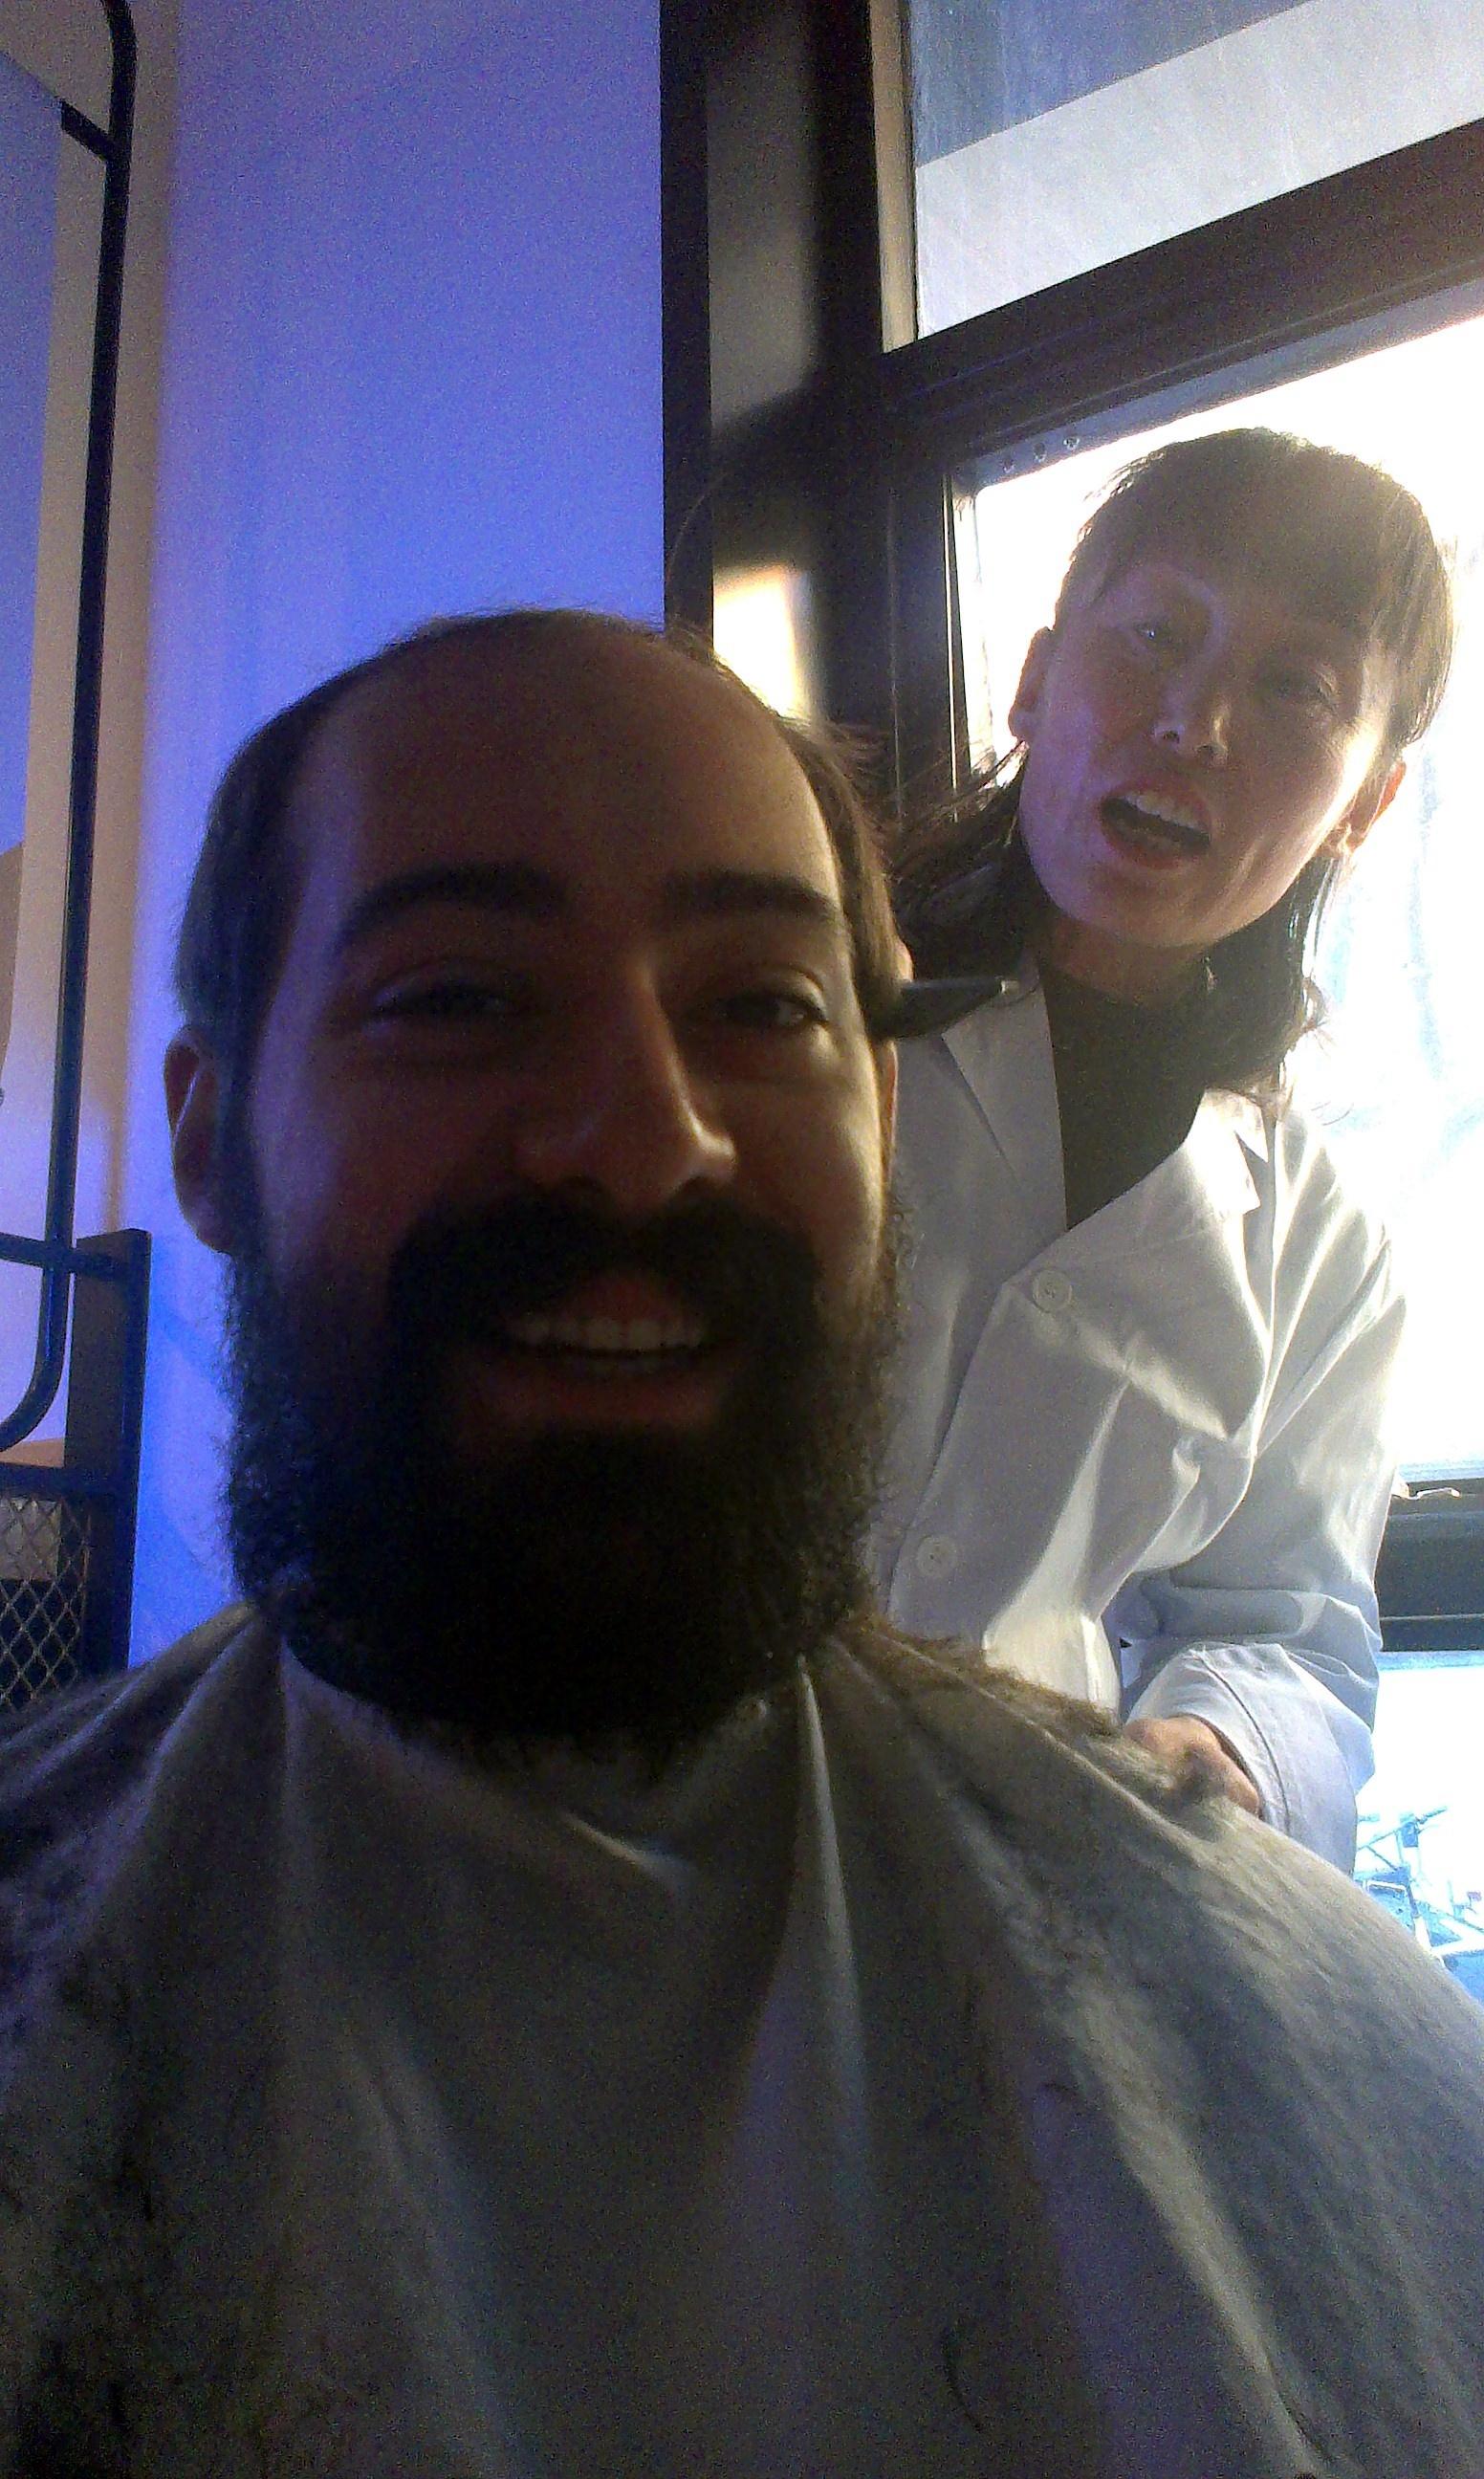 mina maovember maovember shave off at the hatchery december 3